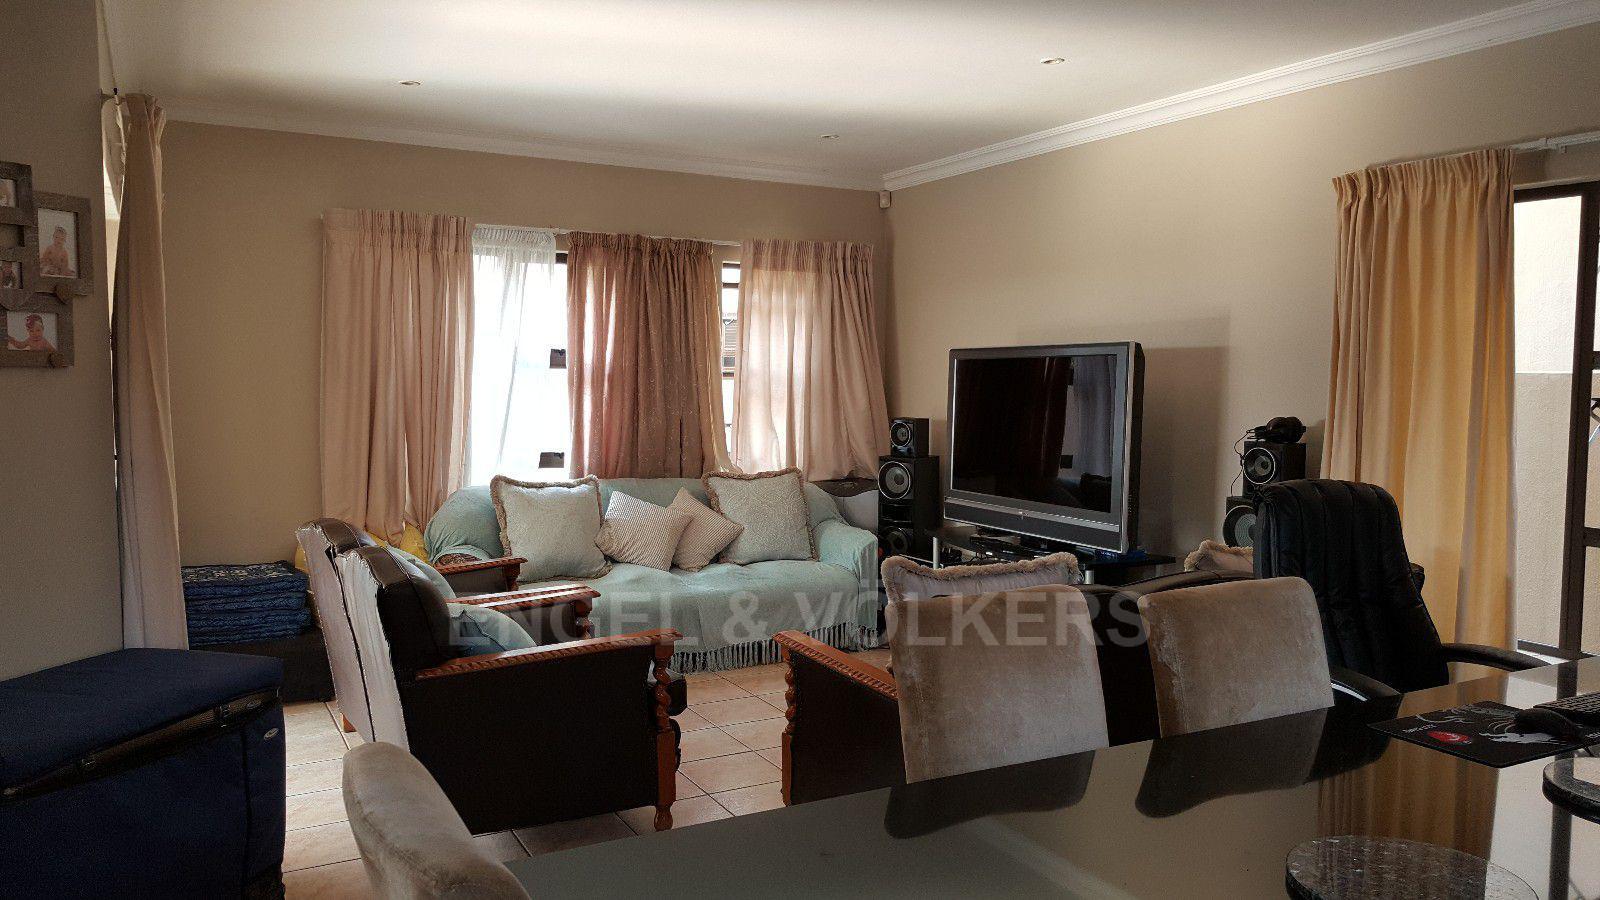 Irene View Estate property for sale. Ref No: 13388279. Picture no 4